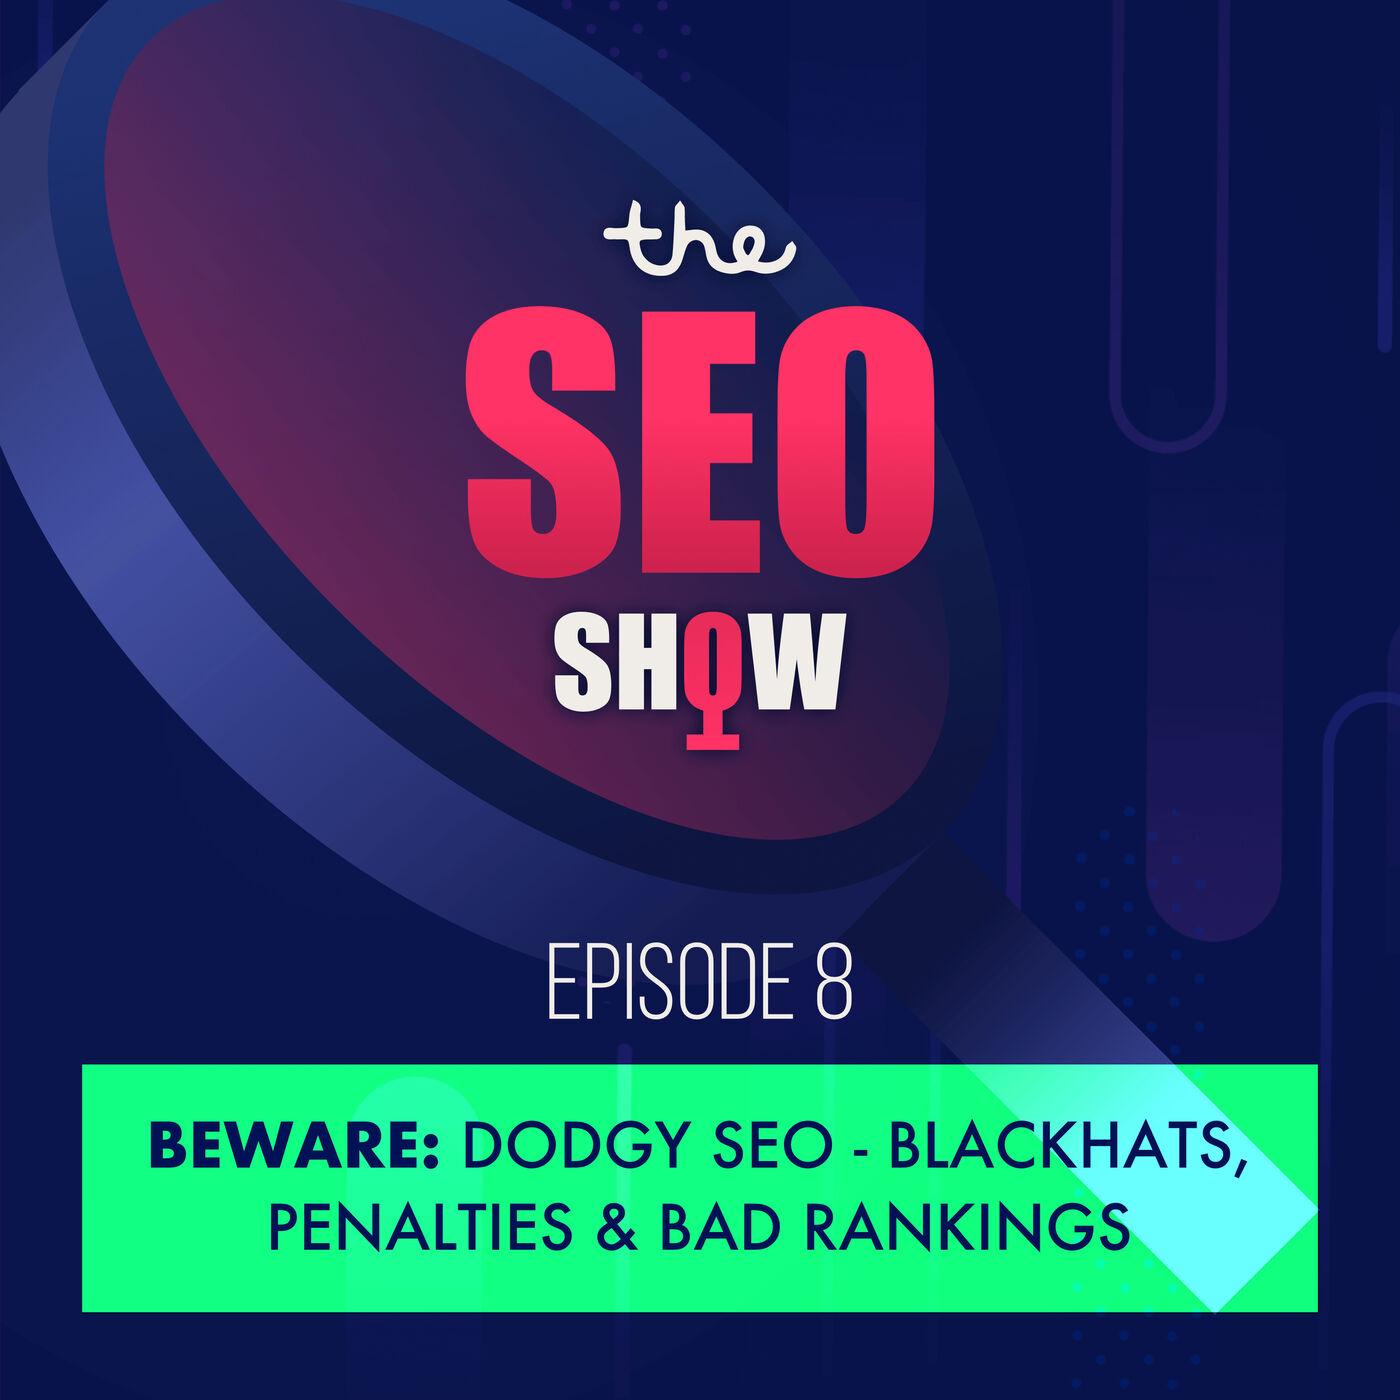 Beware: Dodgy SEO - Blackhats, Penalties & Bad Rankings - Episode 008